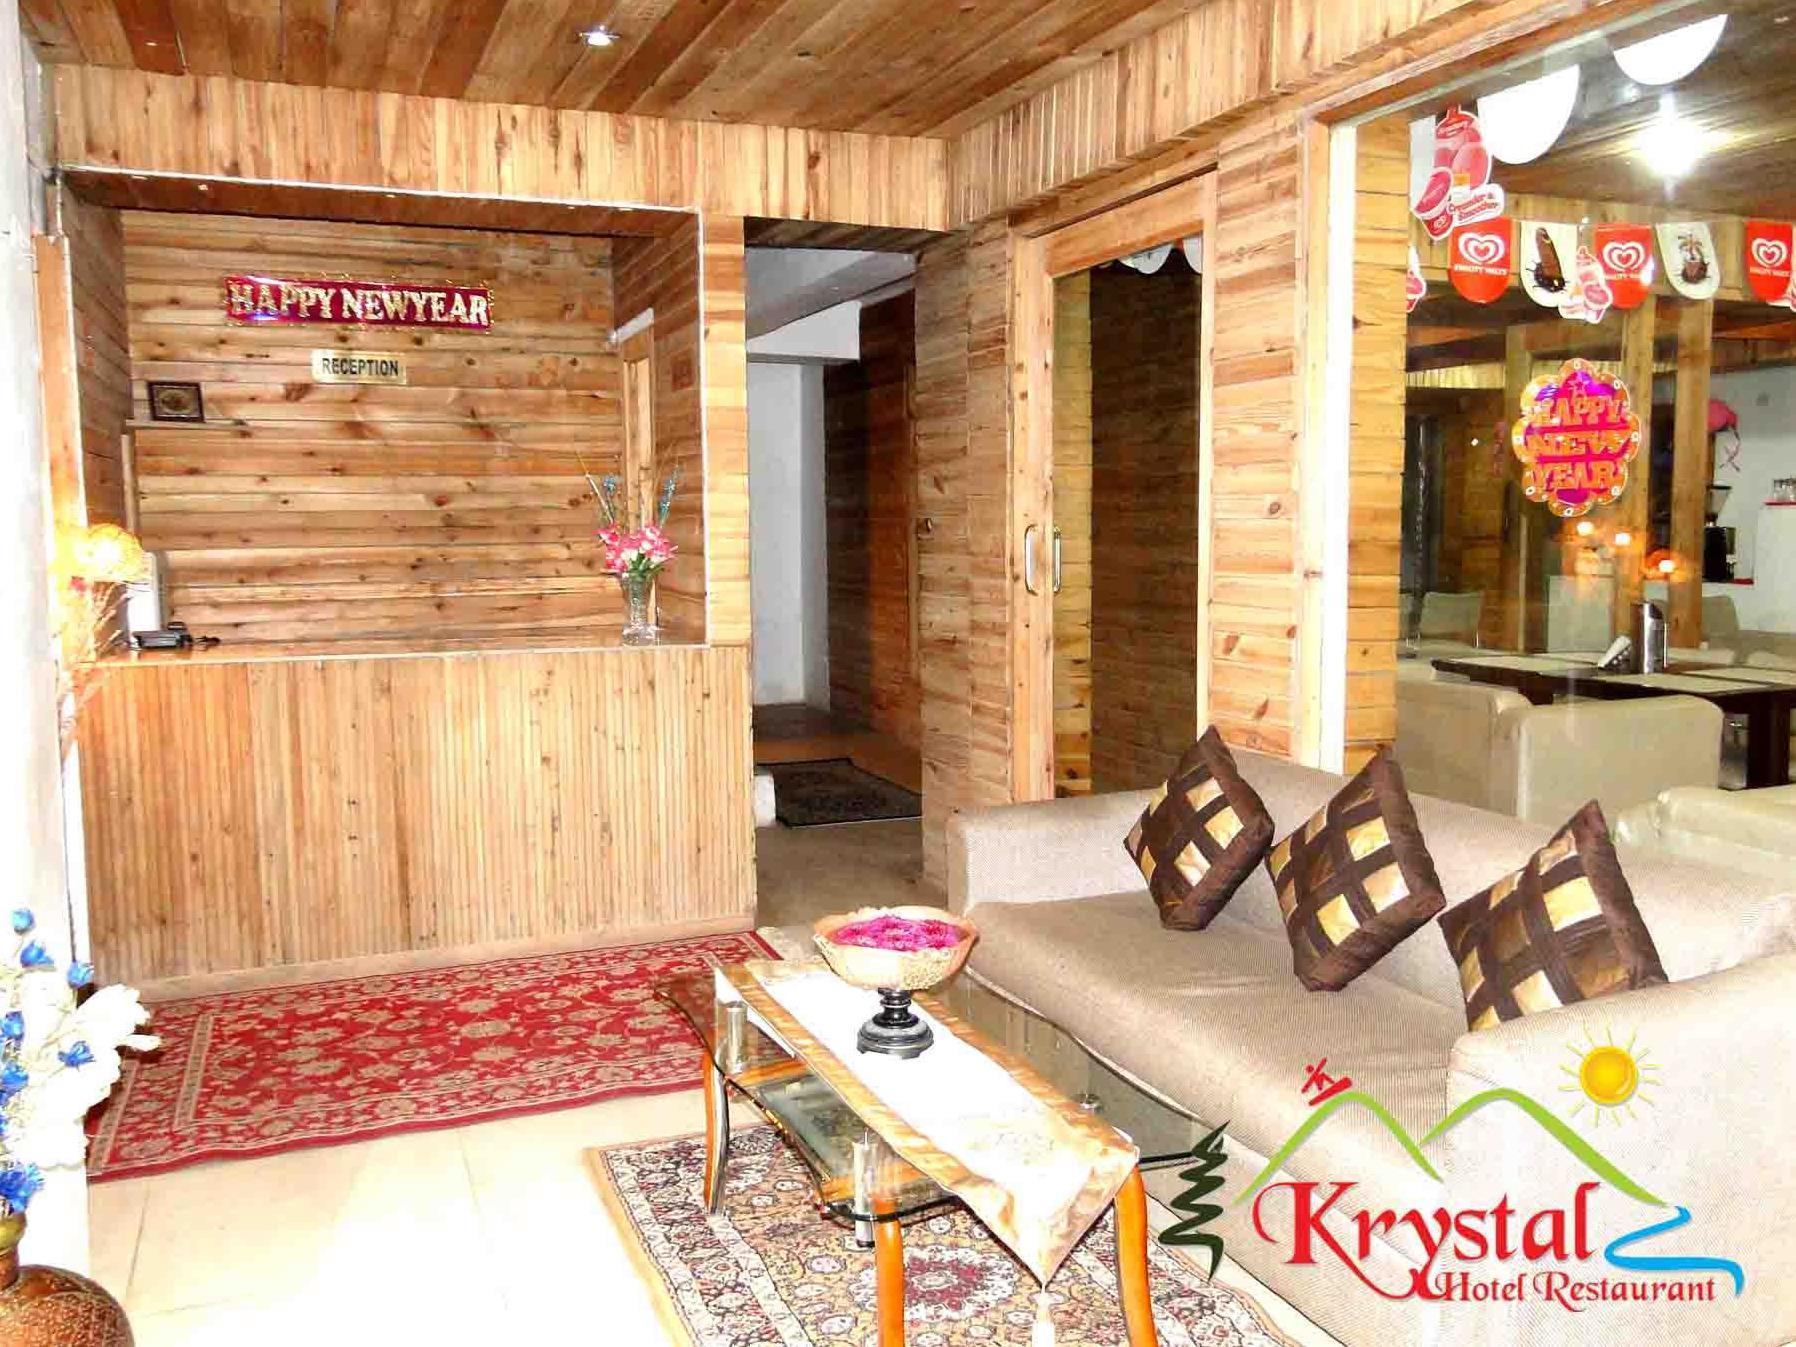 Hotel Jai Skahan Krystal Hotel Restaurant Jammu India Great Discounted Rates